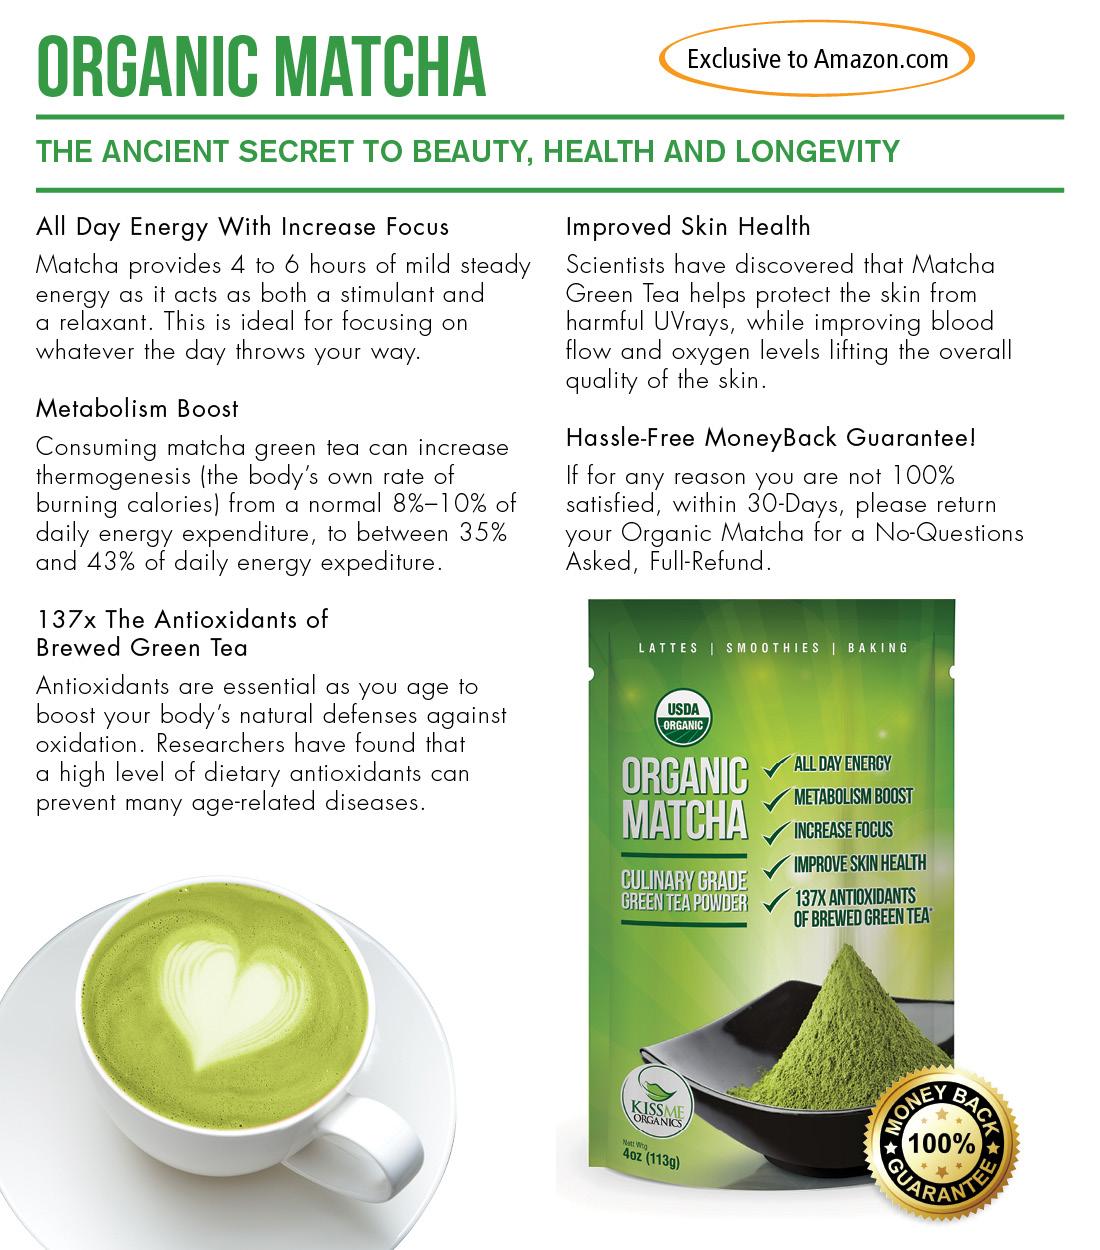 Kiss Me Organics Matcha Green Tea Review